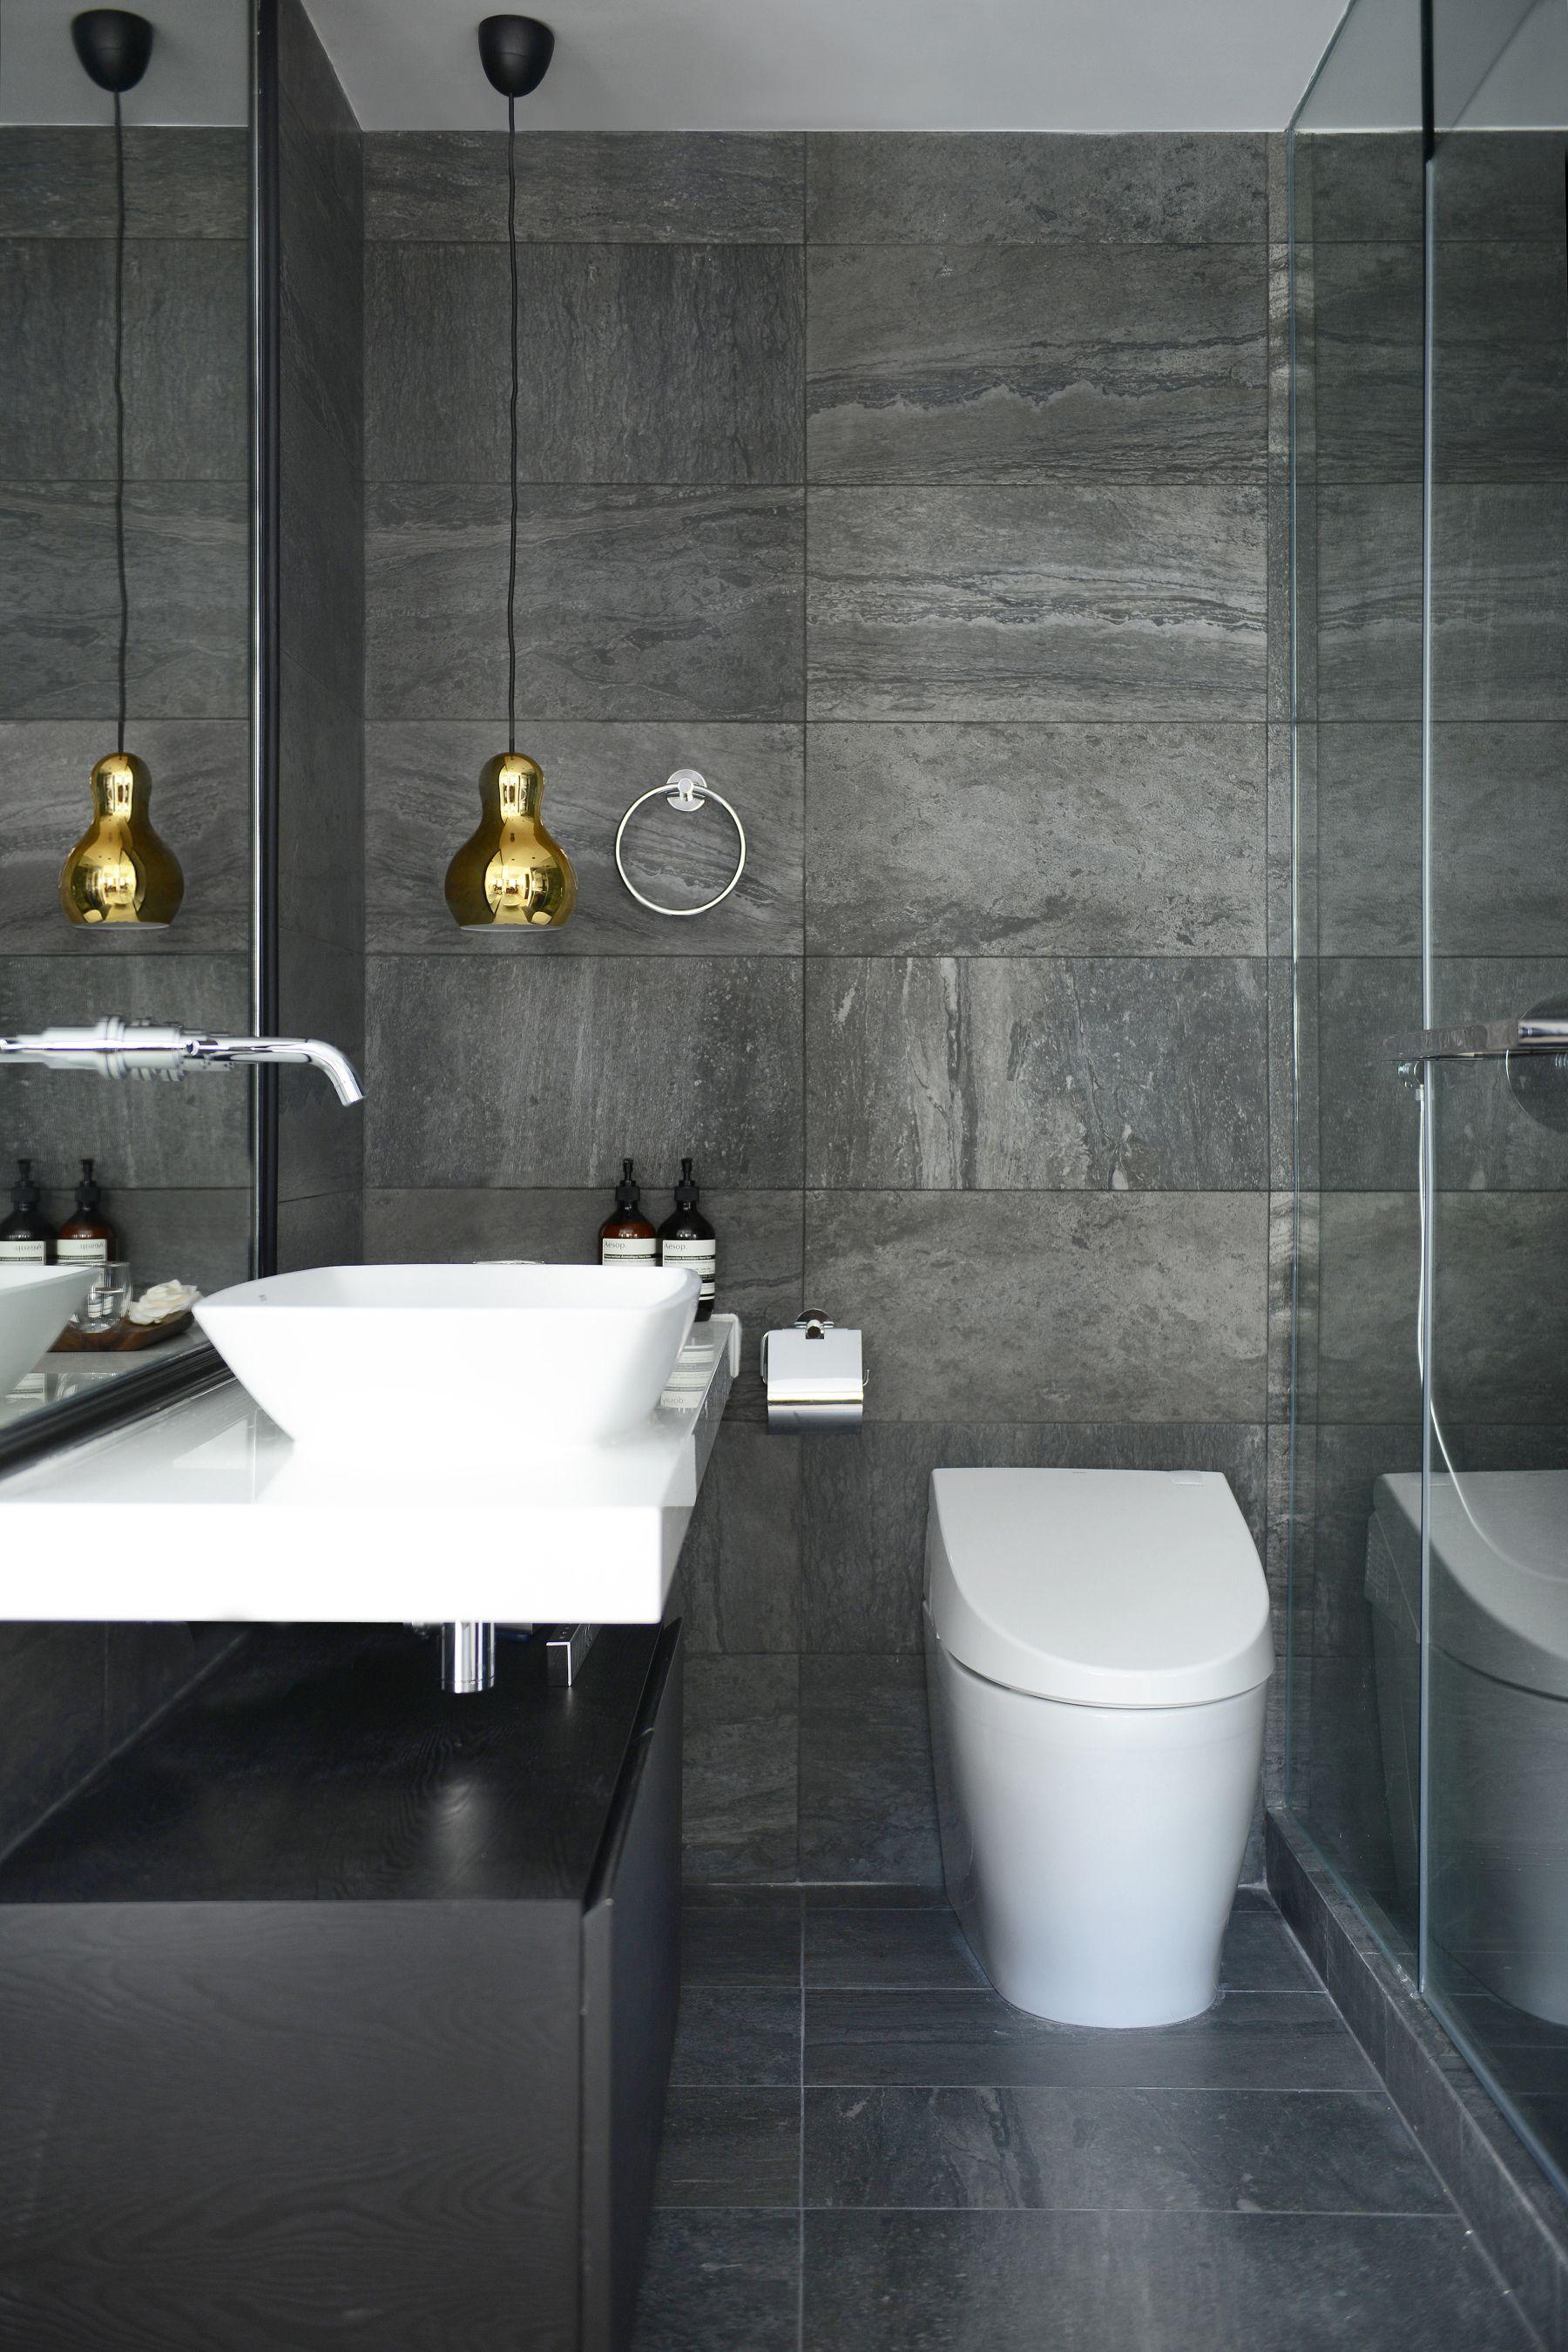 Hooly Bathroom Graue Badfliesen Schiefer Badezimmer Badezimmer